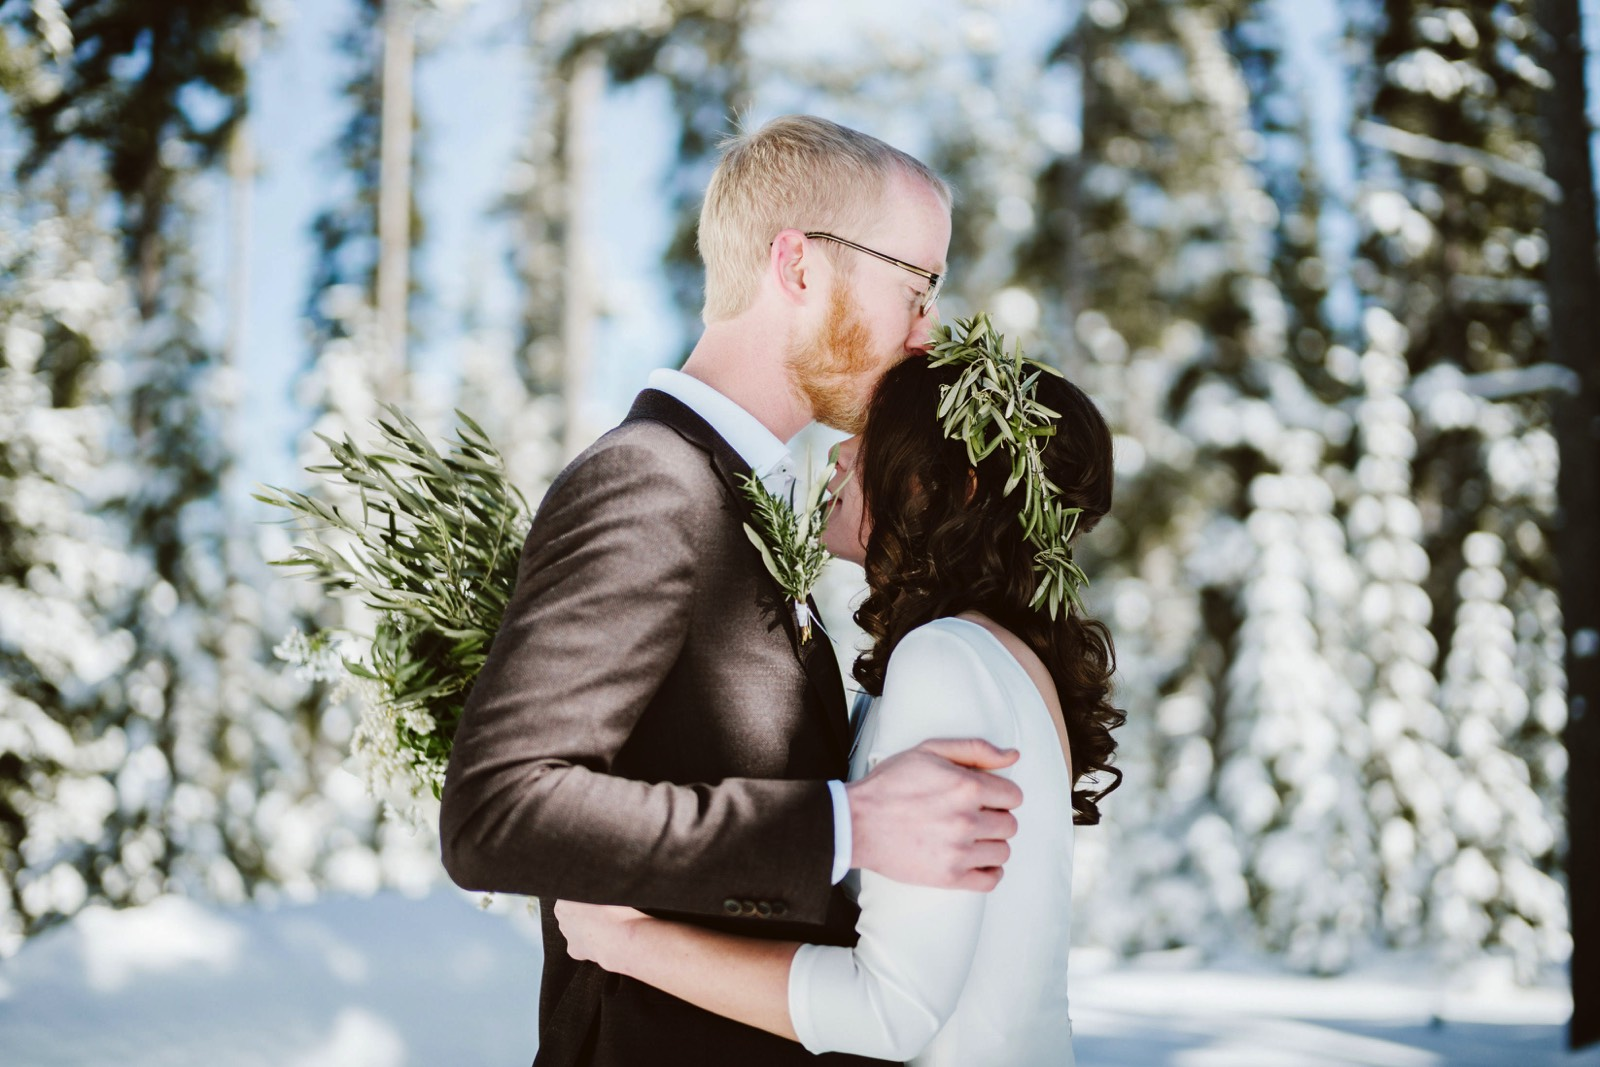 alpine-lakes-high-camp-winter-wedding-19 ALPINE LAKES HIGH CAMP WEDDING